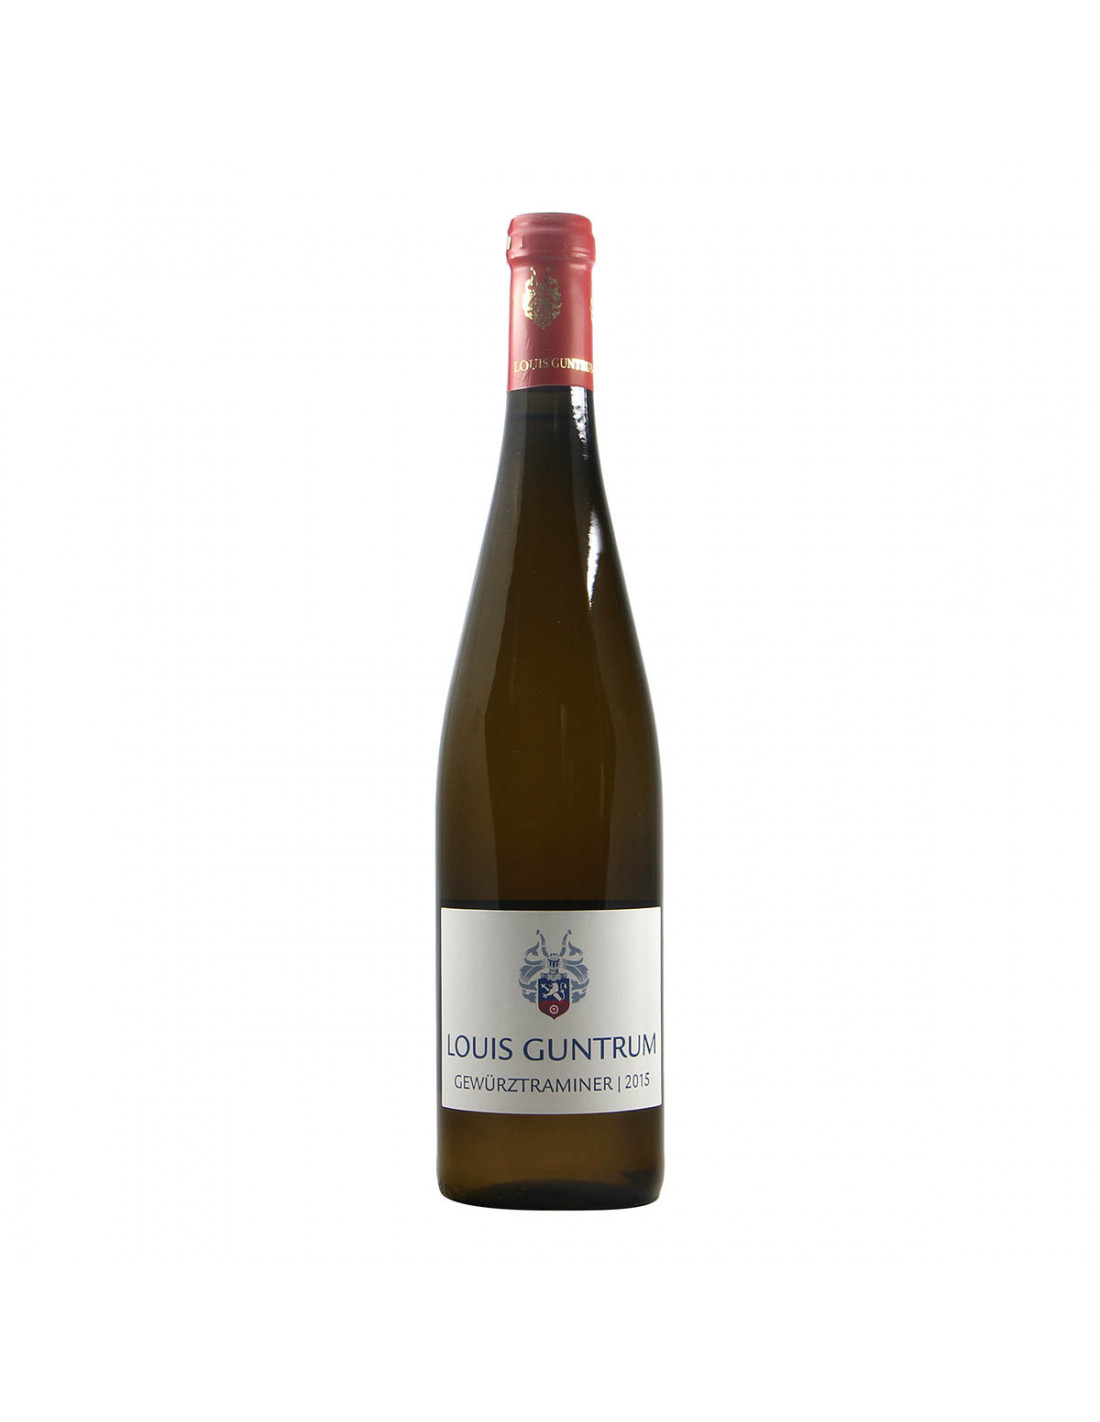 Louis Guntrum Gewurztraminer 2015 Grandi Bottiglie